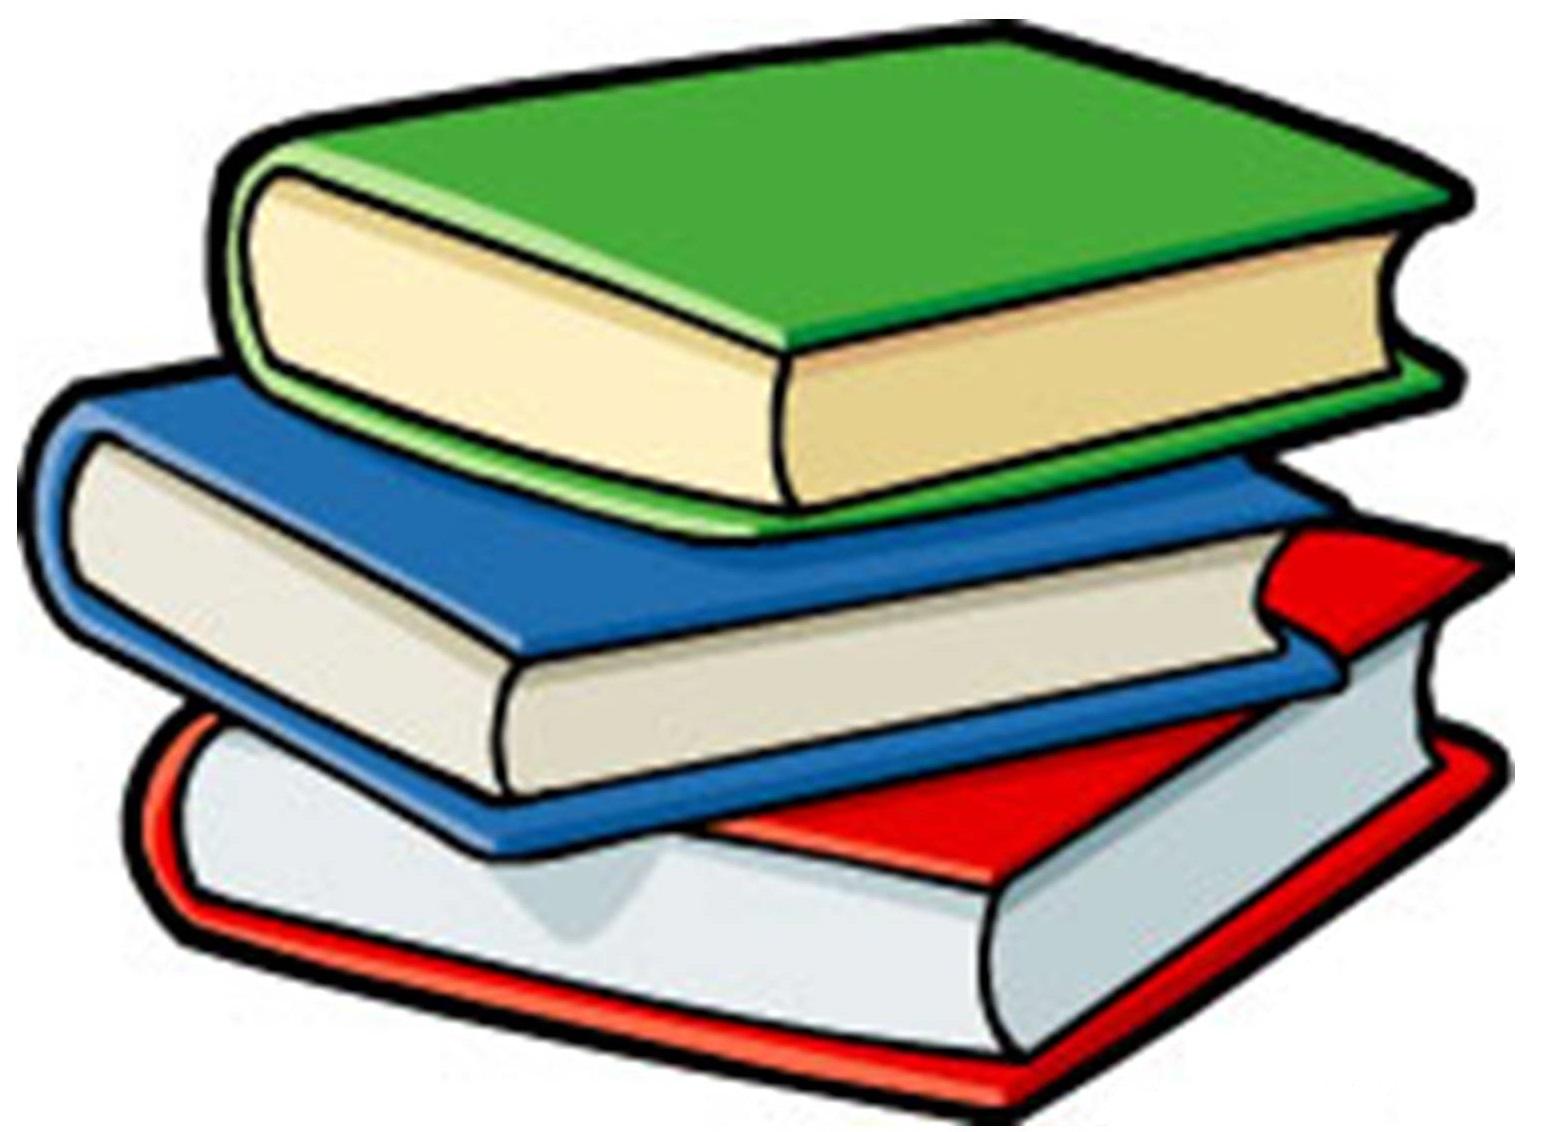 Book clipart english book Information: Clipart Gallery Info Algebra